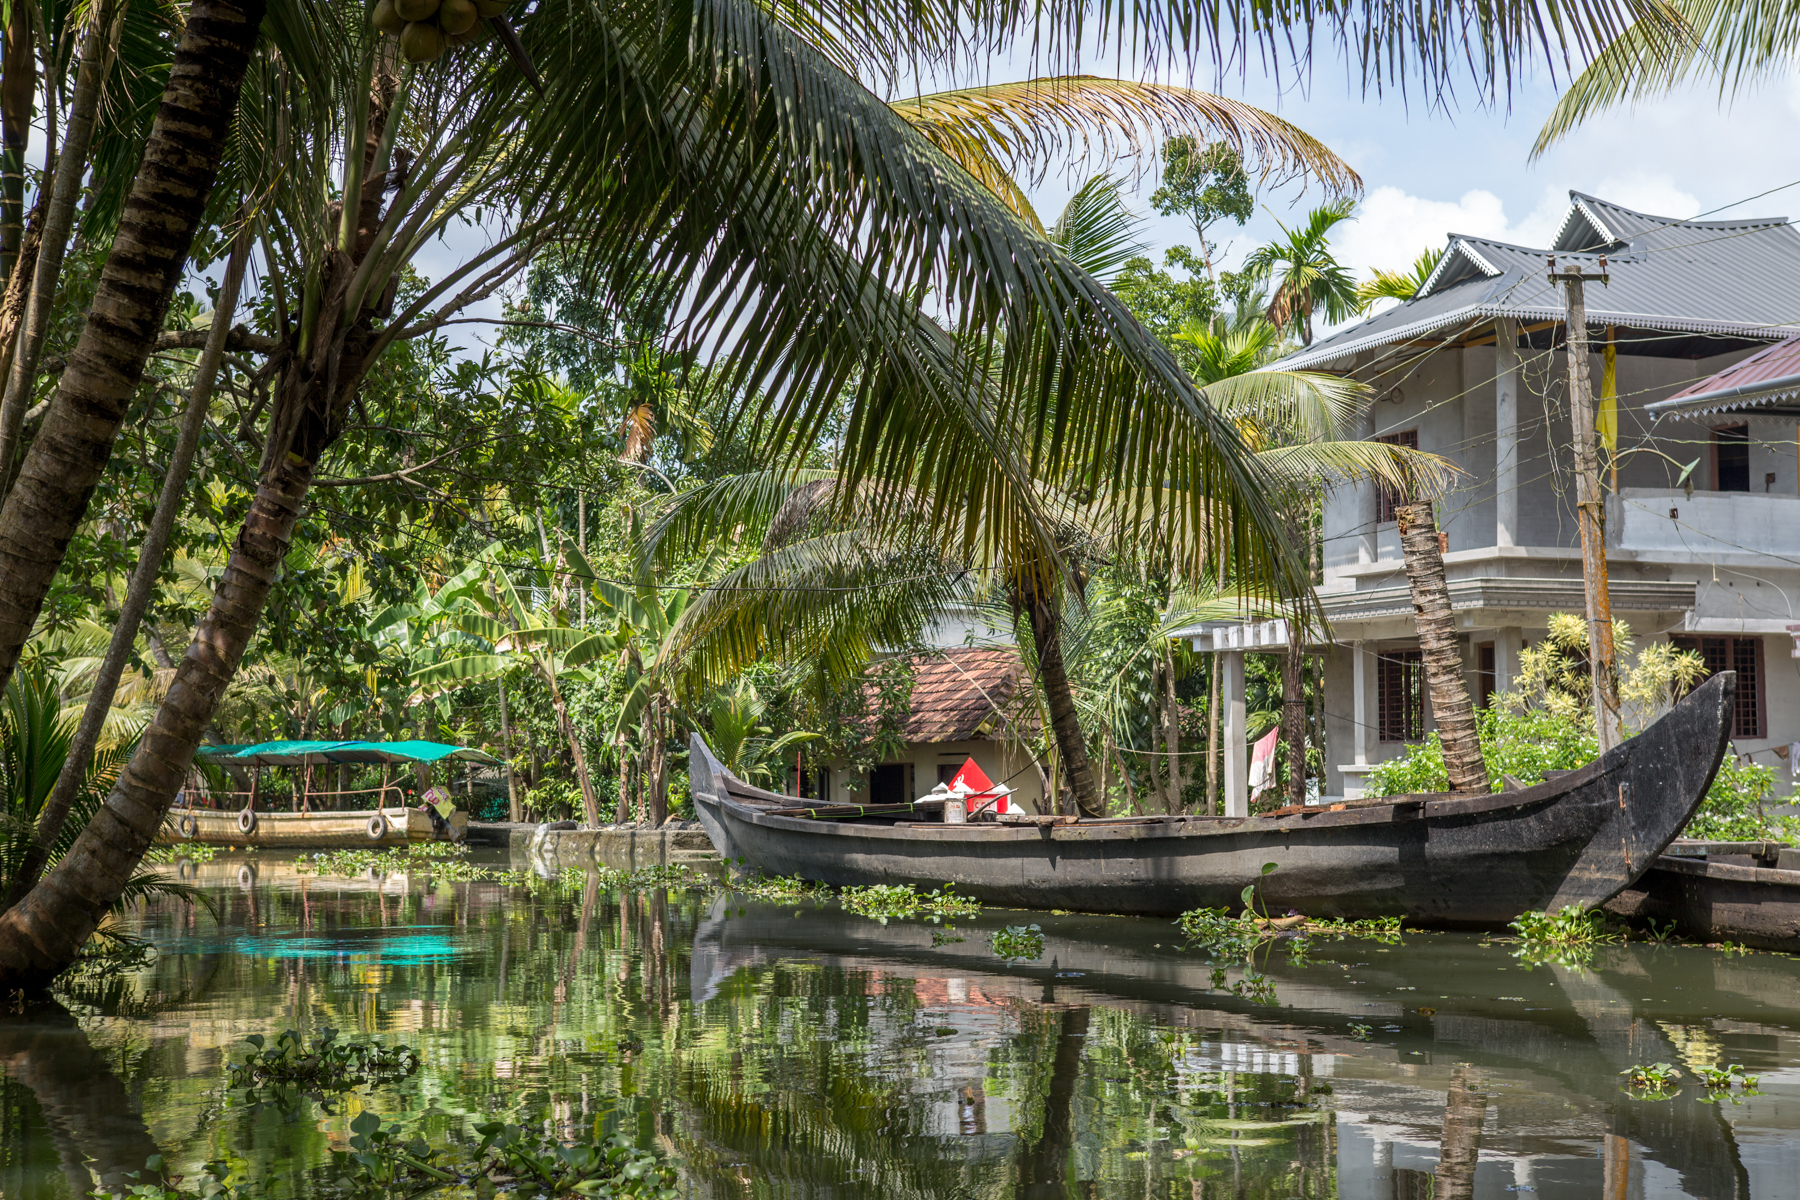 backwaters-inde-kerala-alleppey-